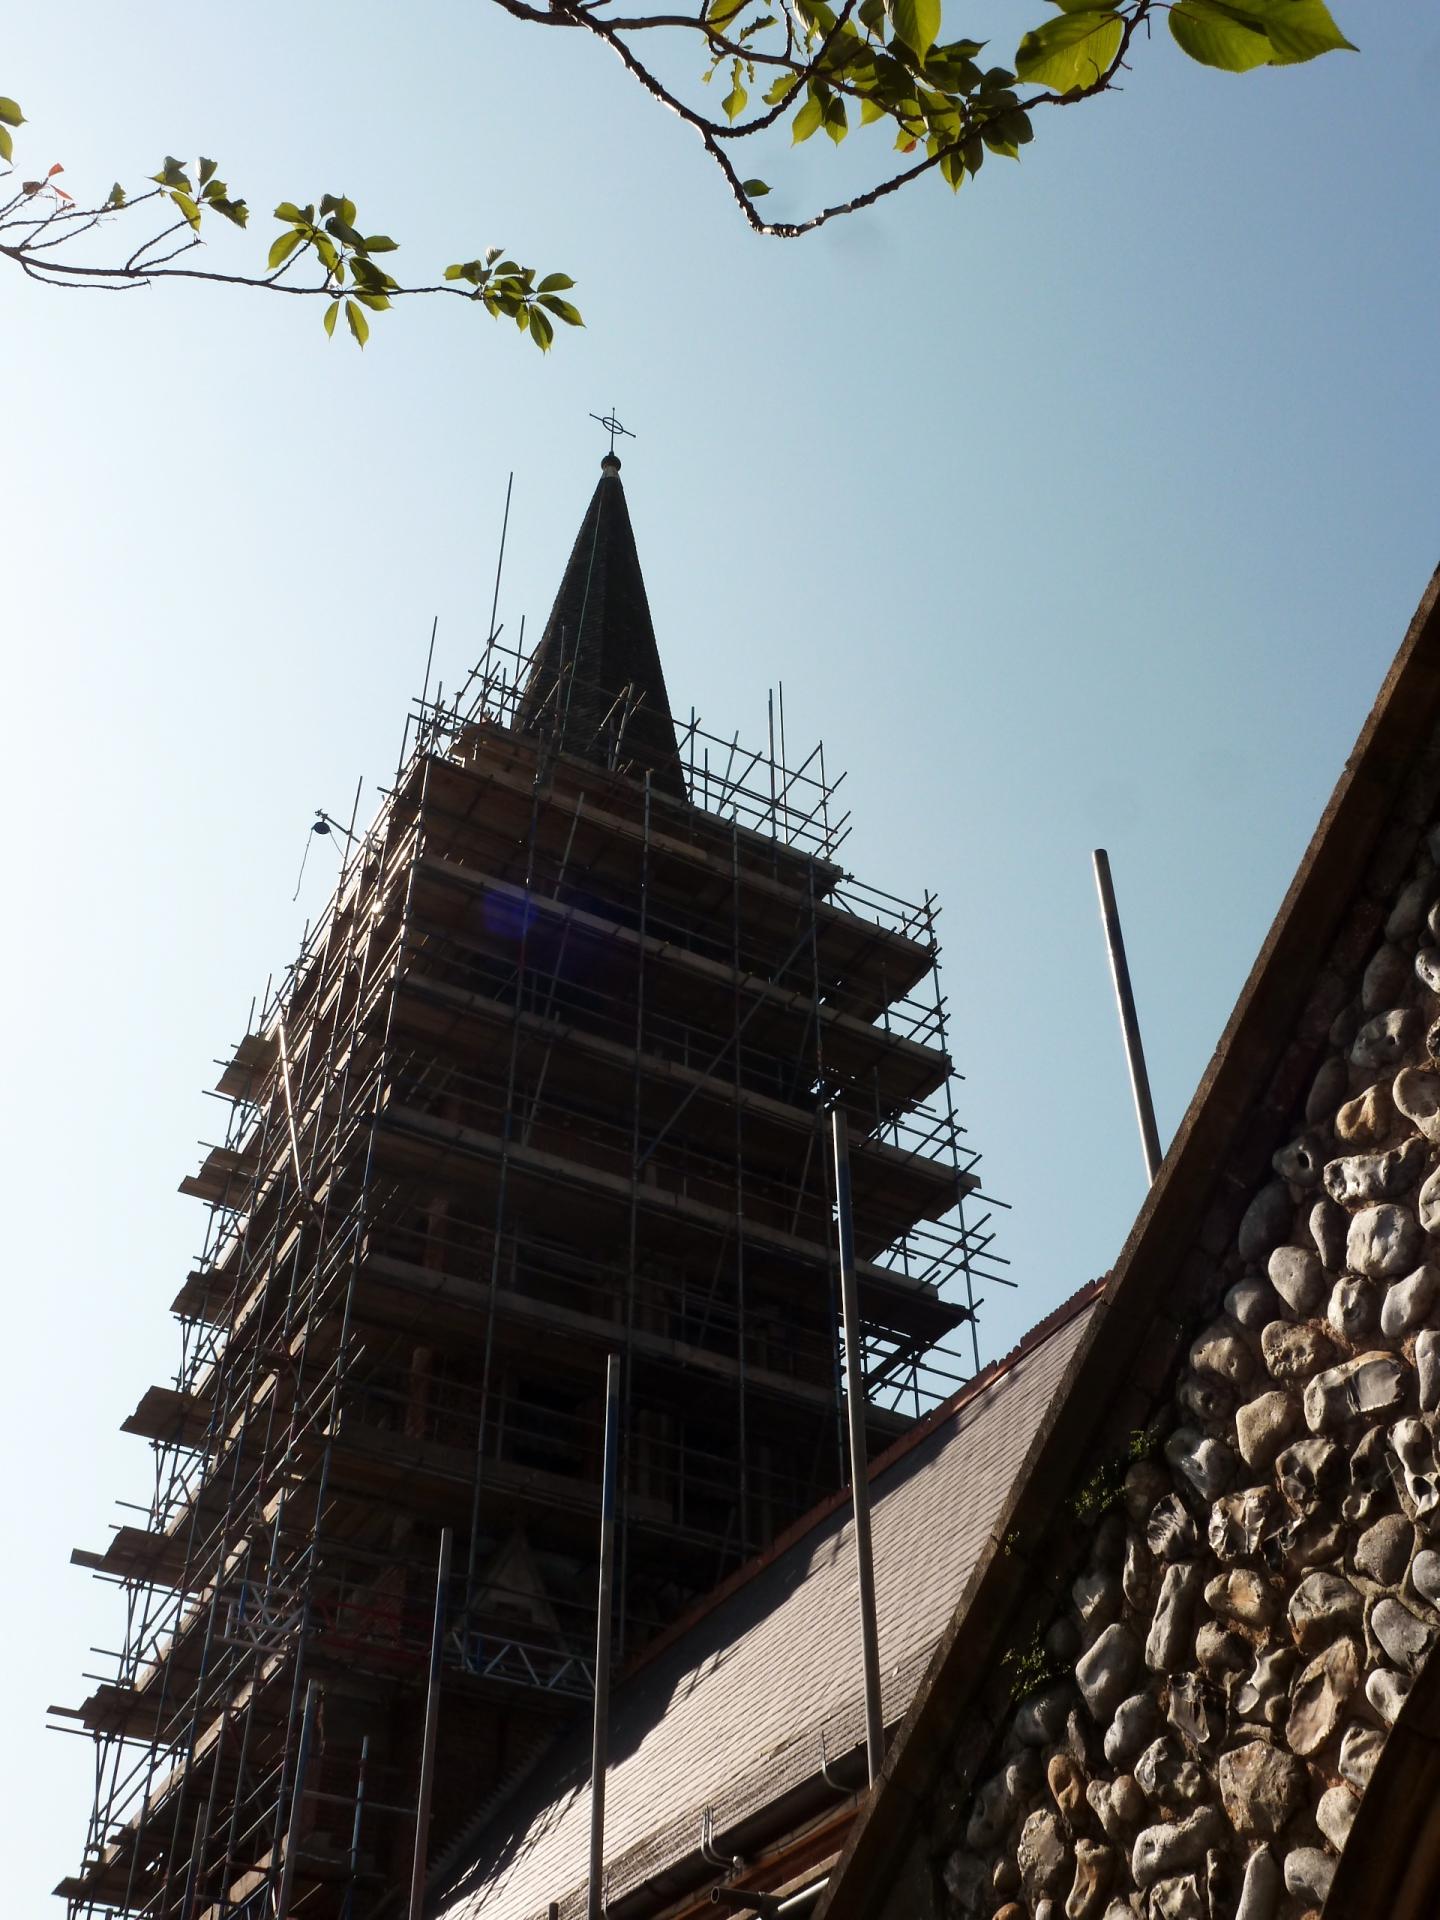 St. Botolph's, Heene scaffolding 26.5.16